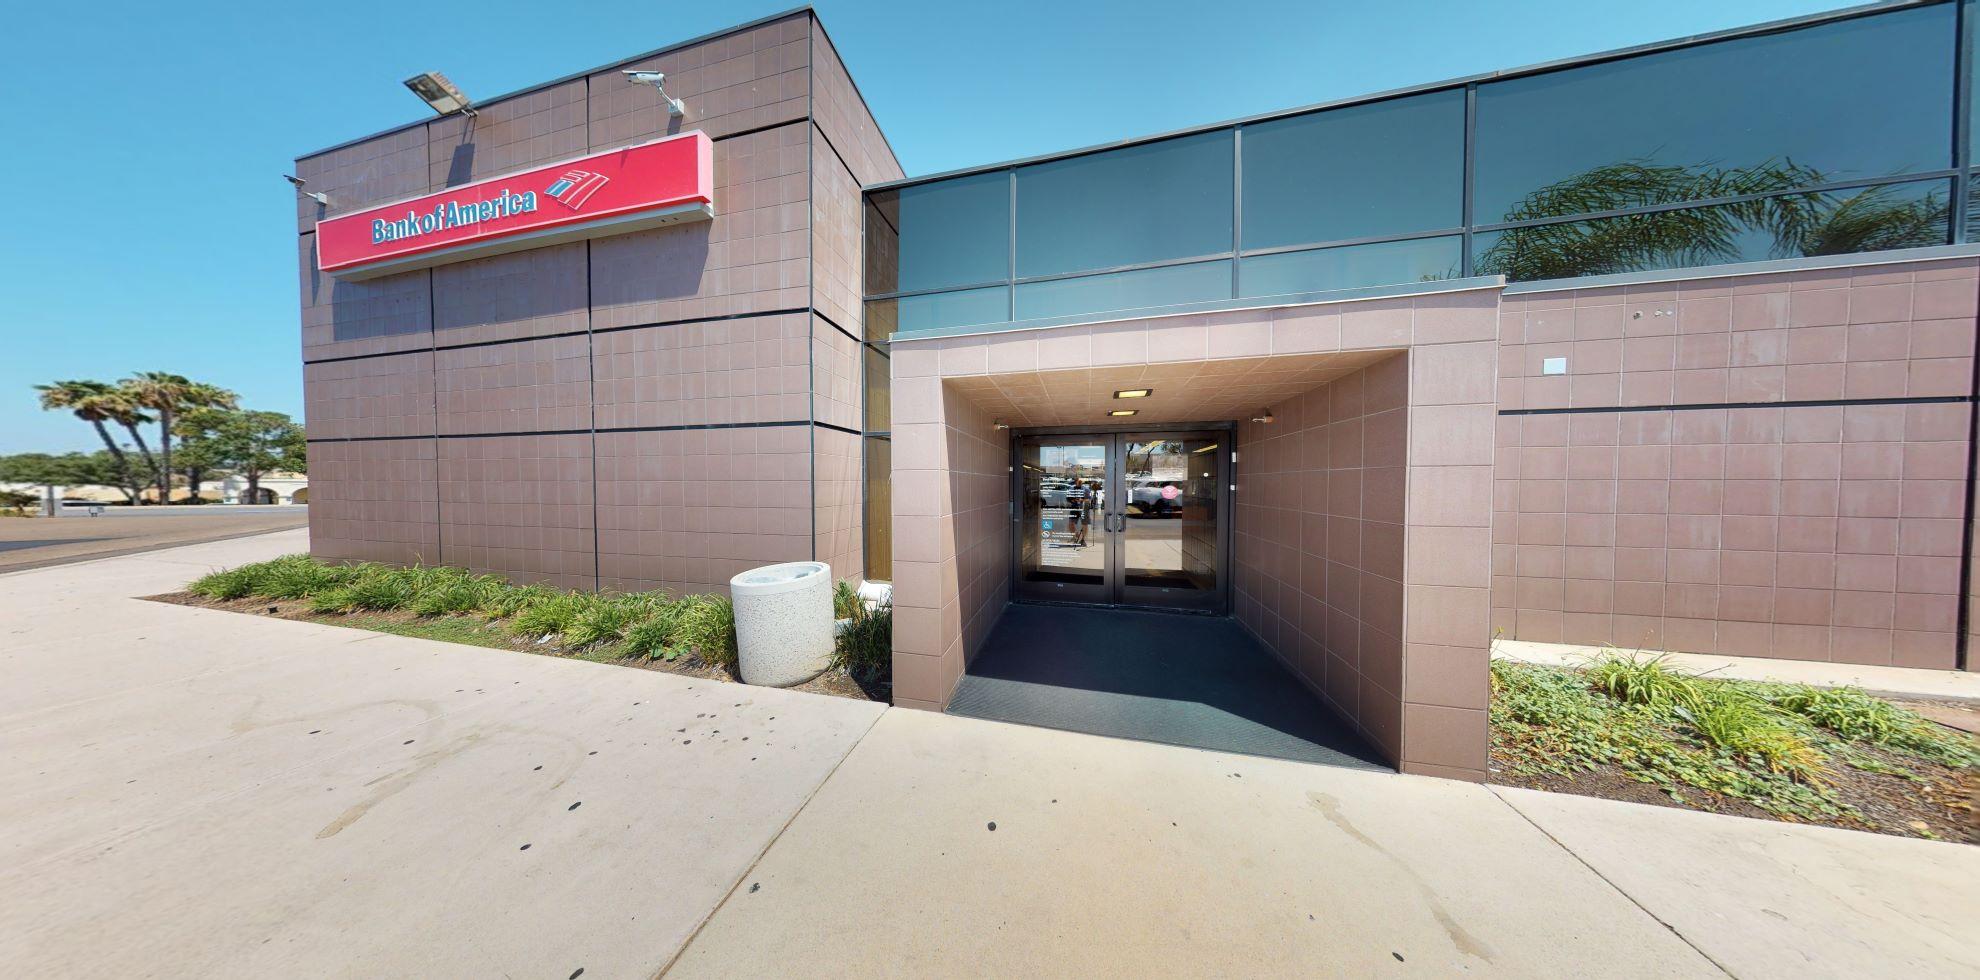 Bank of America financial center with walk-up ATM | 5500 Grossmont Center Dr STE 401, La Mesa, CA 91942